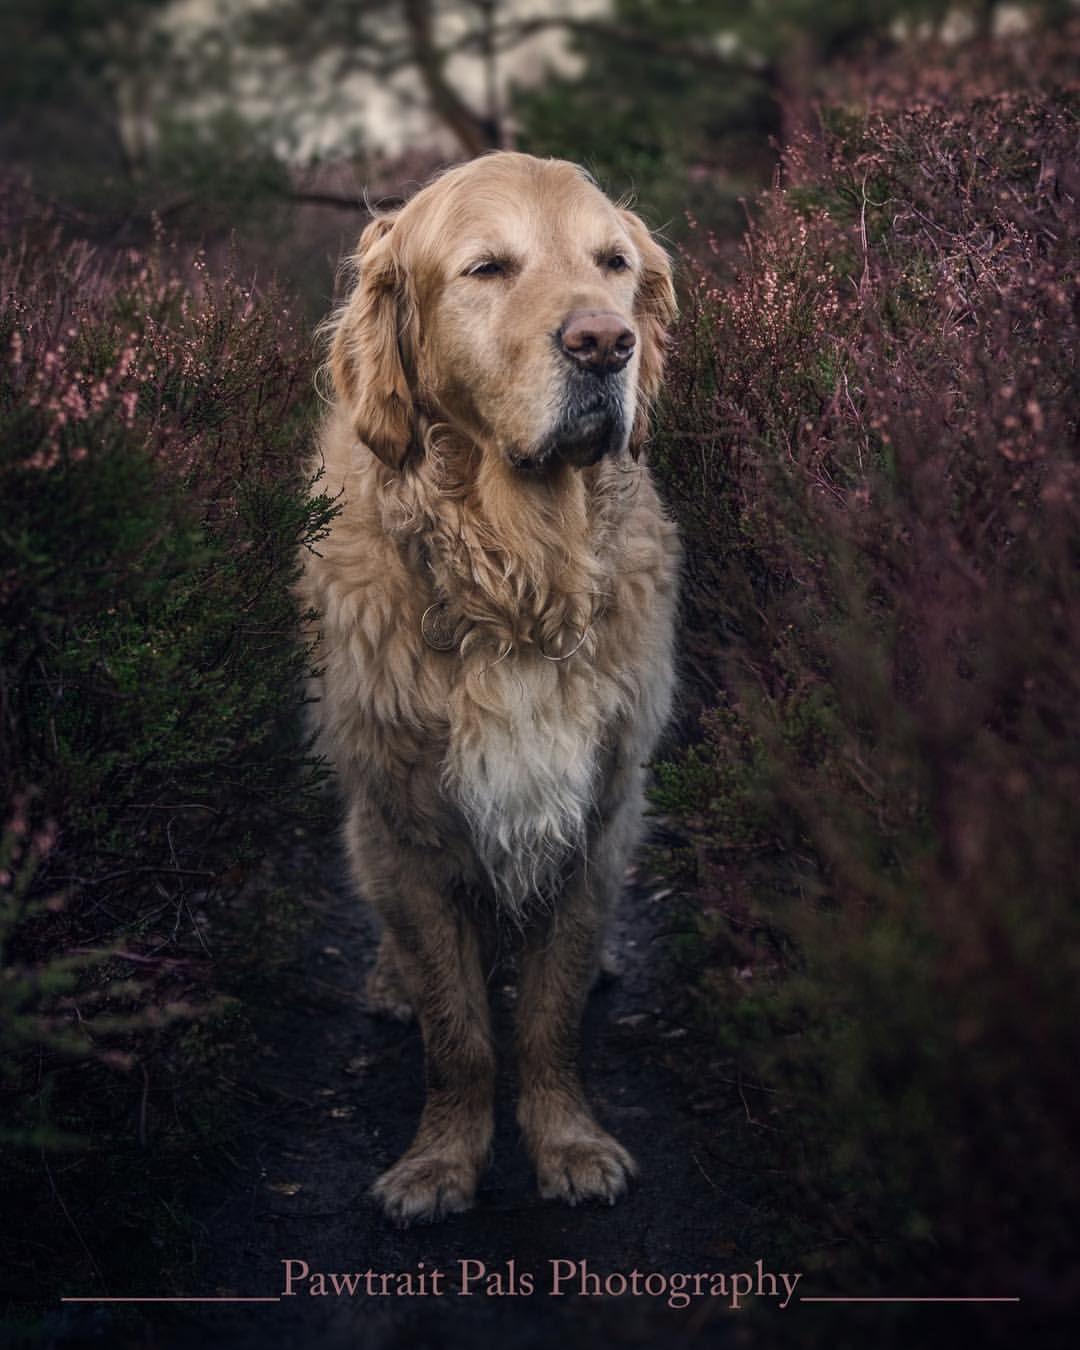 21 Likes 0 Comments Pawtrait Pals Pet Photography Pawtraitpals On Instagram Sundays Mean Me And My Dogs Ge Animal Photography Me And My Dog Outdoor Dog